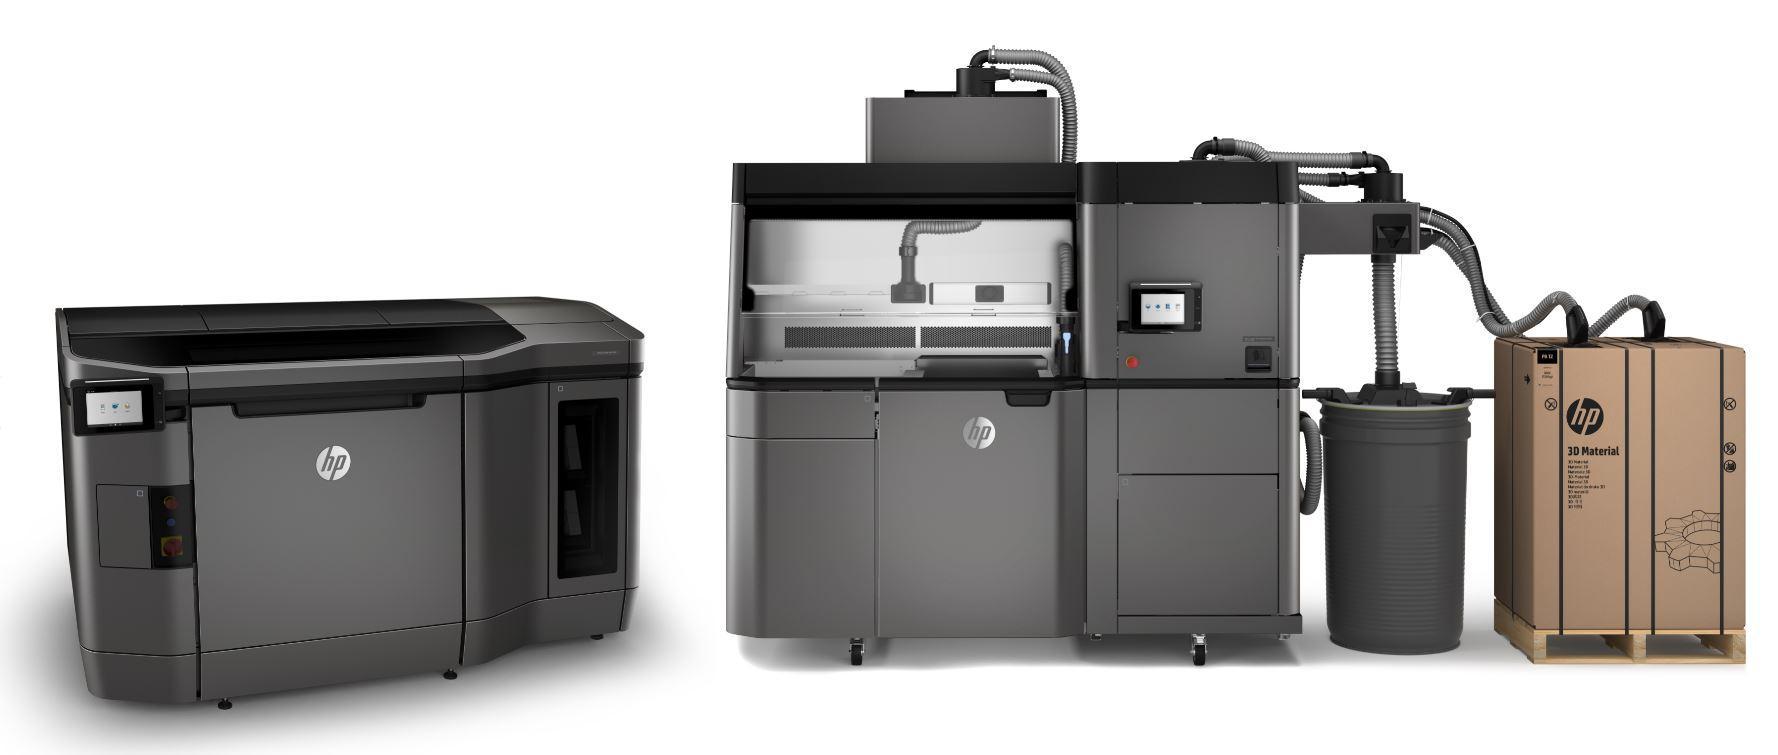 HP-Multi-Jet-Fusion-4200-Refurbished Maschinensuche HP-Multi-Jet-Fusion-4200-Gebraucht 3D-Drucker-gebraucht HP-3D-Drucker-gebraucht